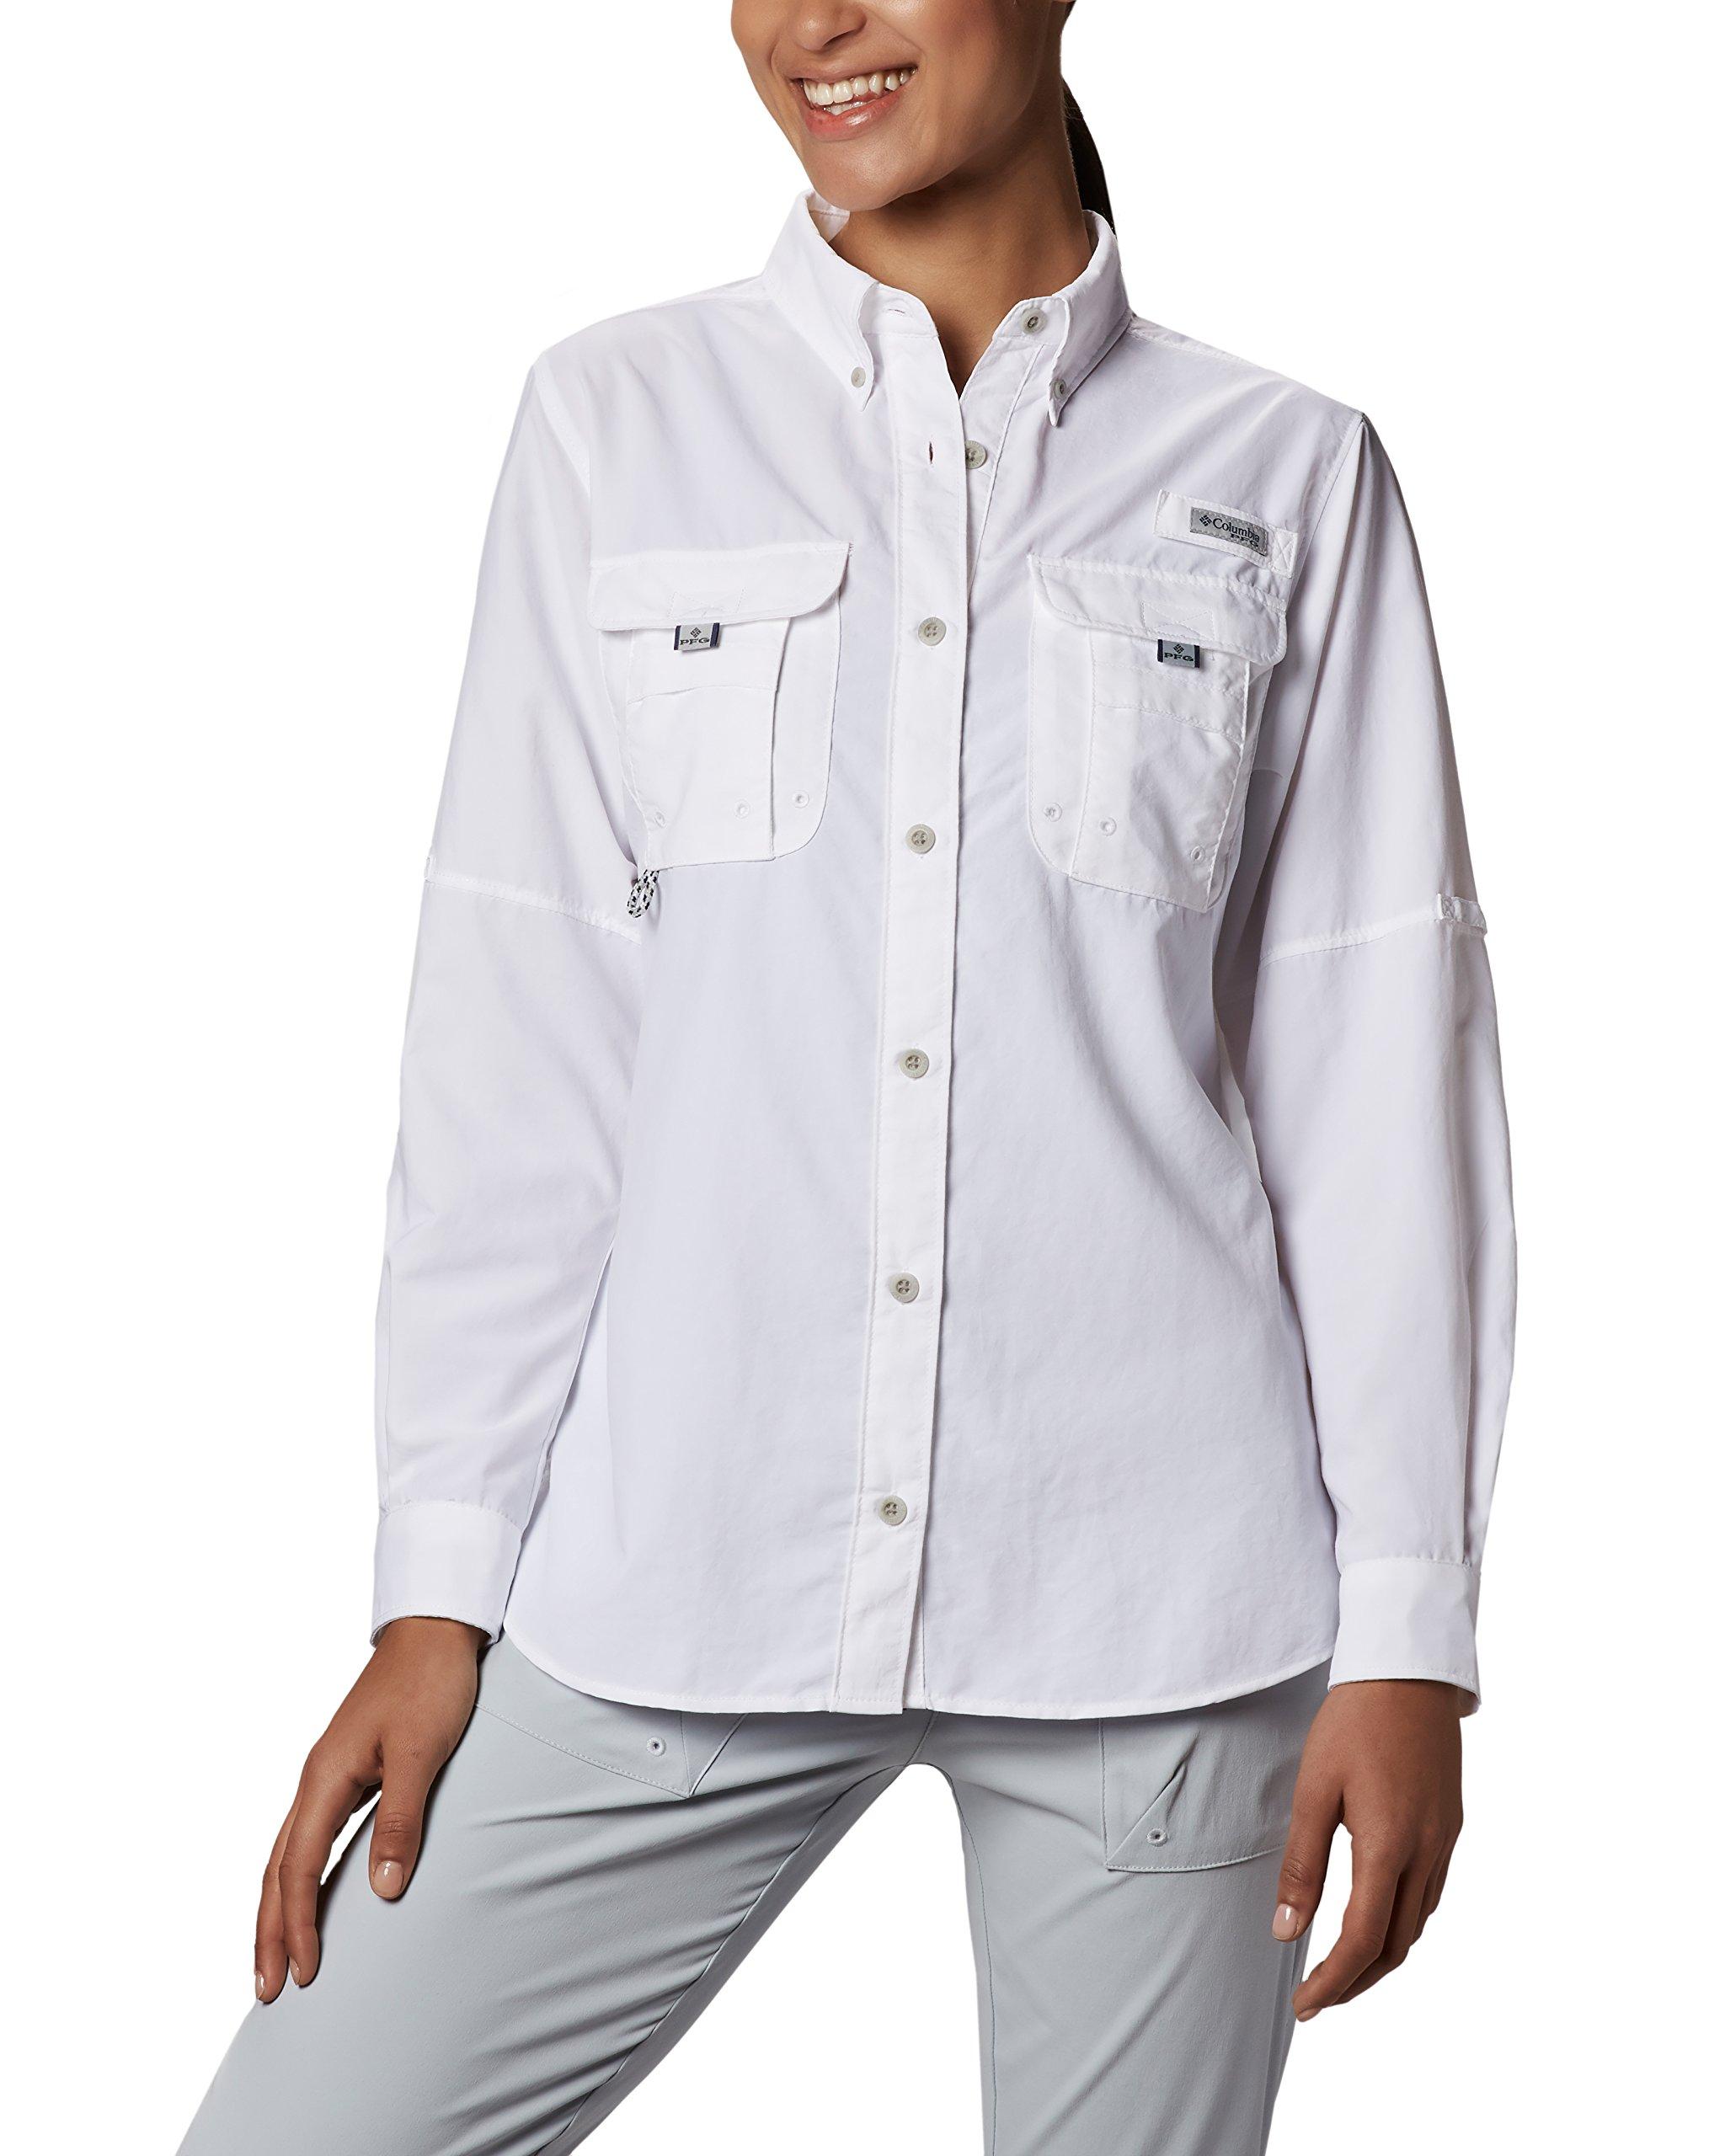 Columbia Women's Bahama Long Sleeve Shirt, White, Medium